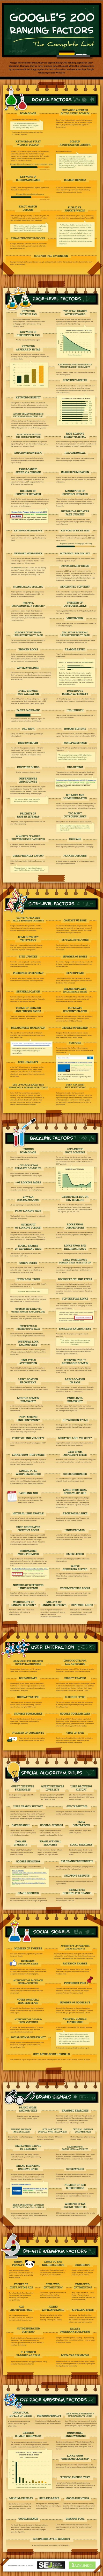 Infographic-Googles-200-Ranking-Factors-637x16014